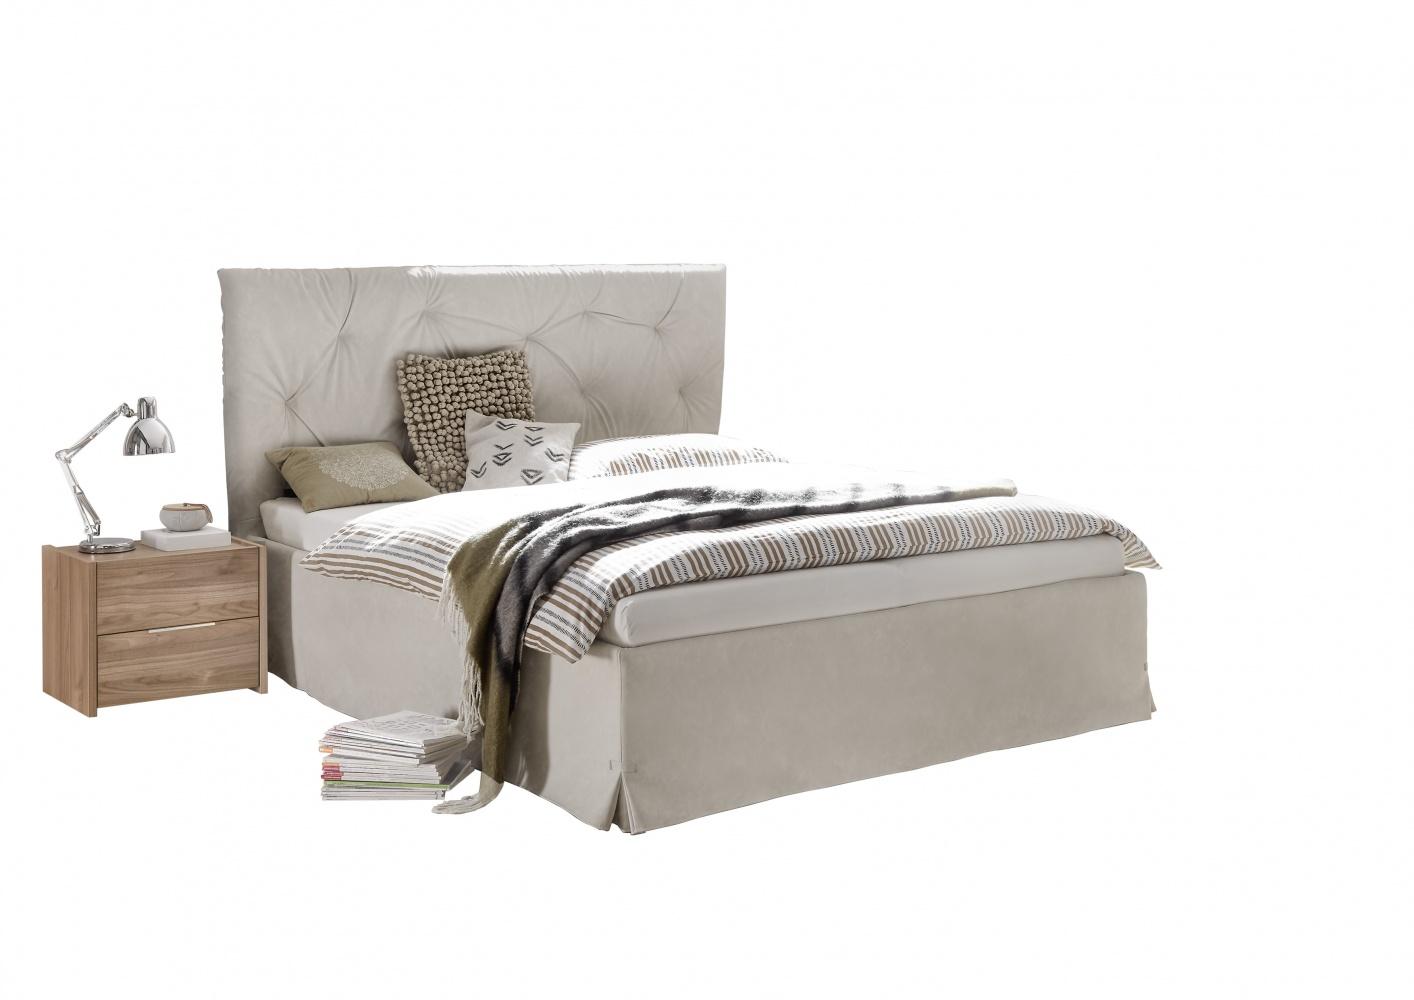 Modernes Bett Kunstleder Natur Luana Alpaca 160x200